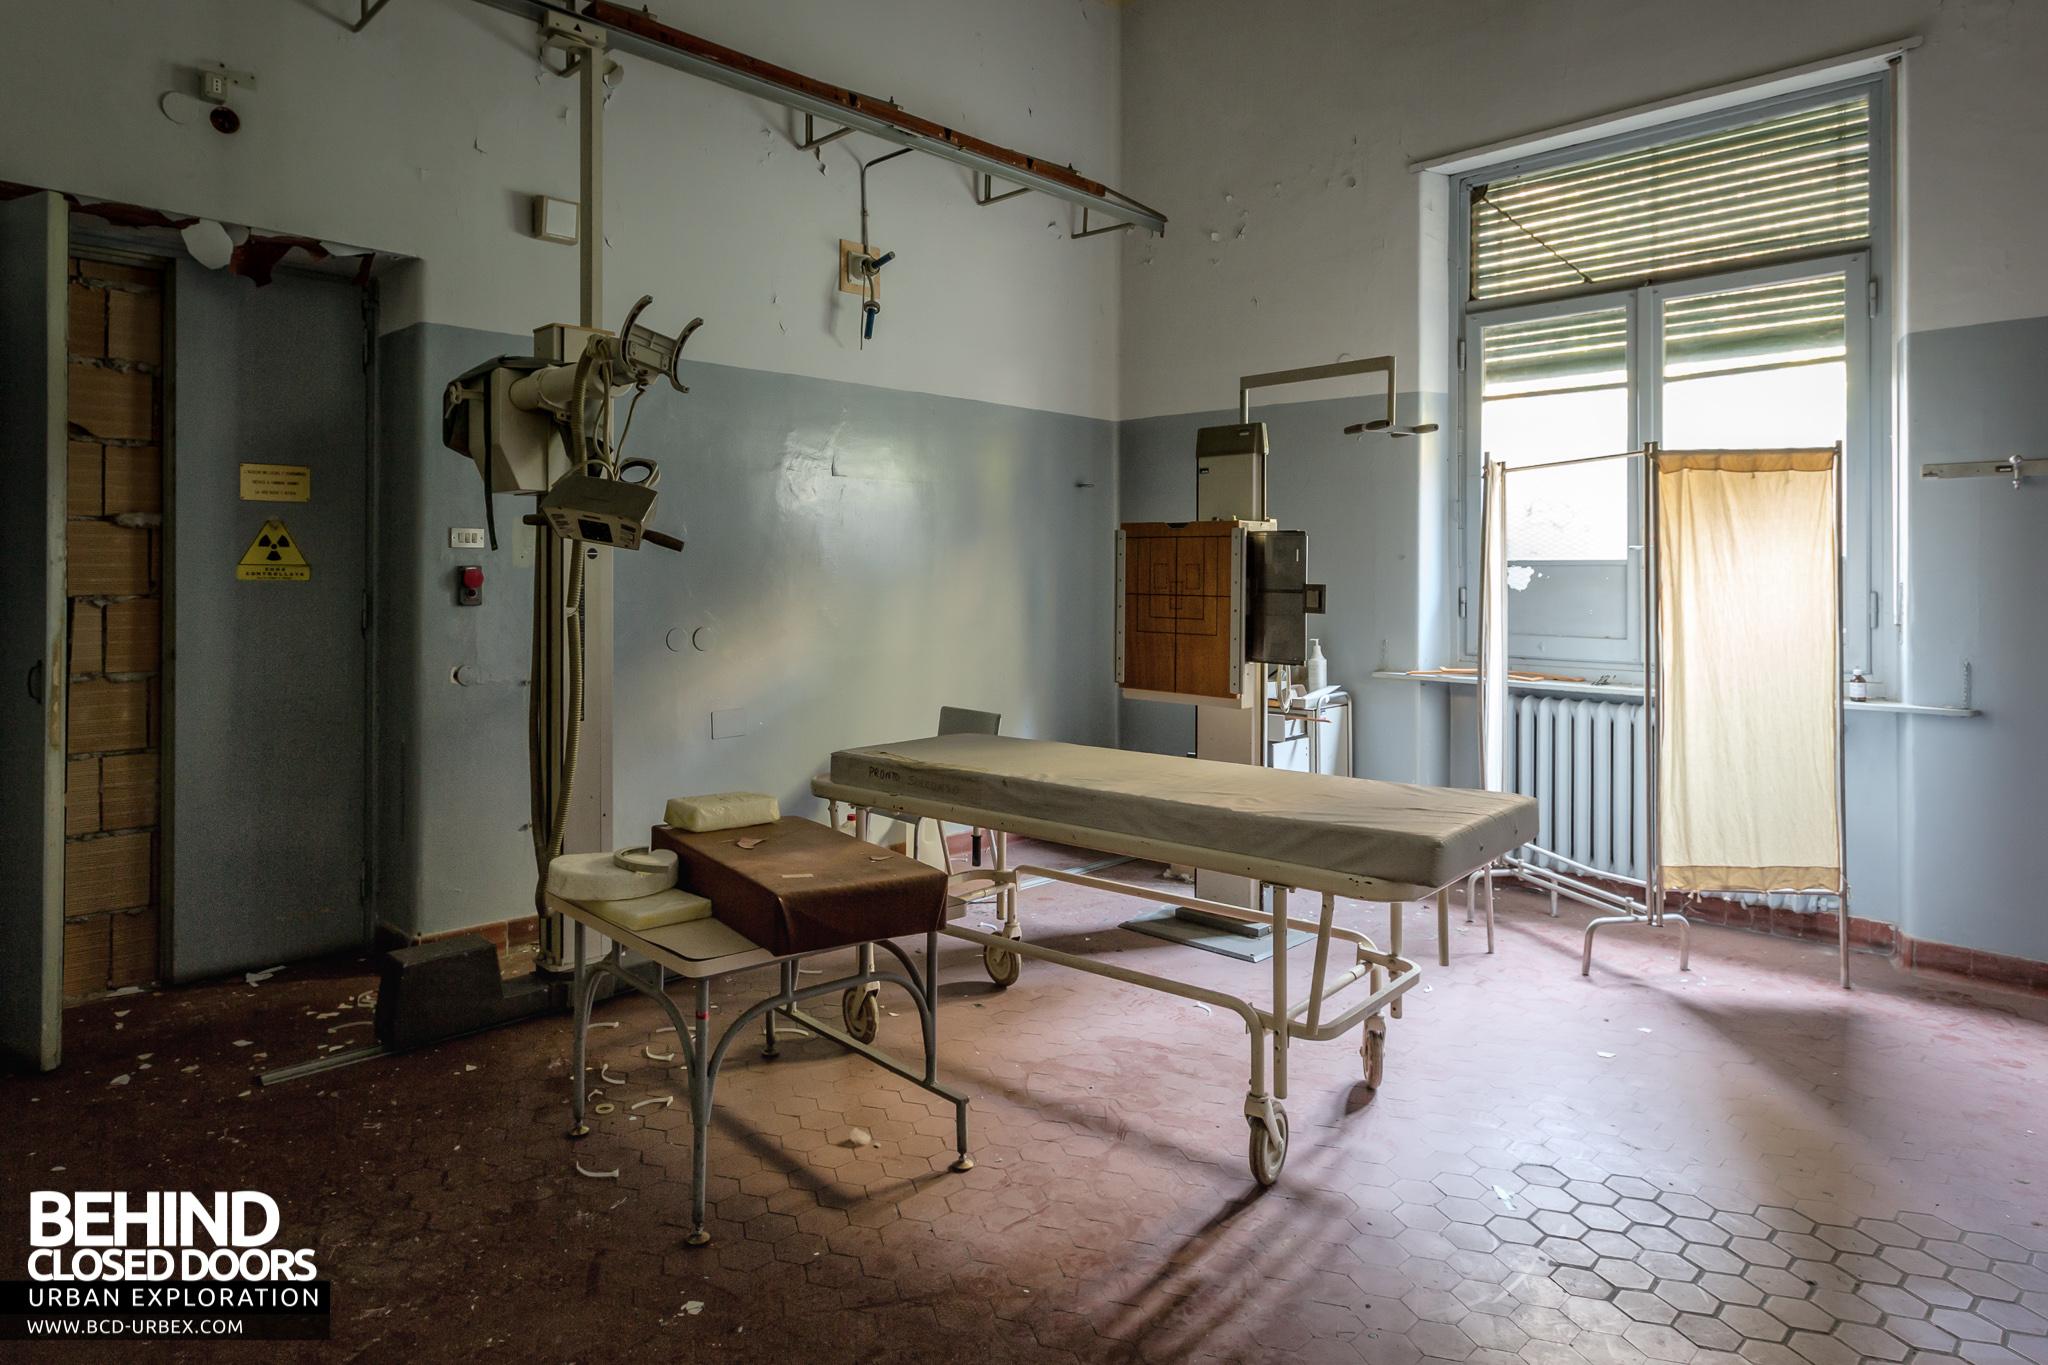 Ospedale Sc Abandoned Hospital Italy 187 Urbex Behind